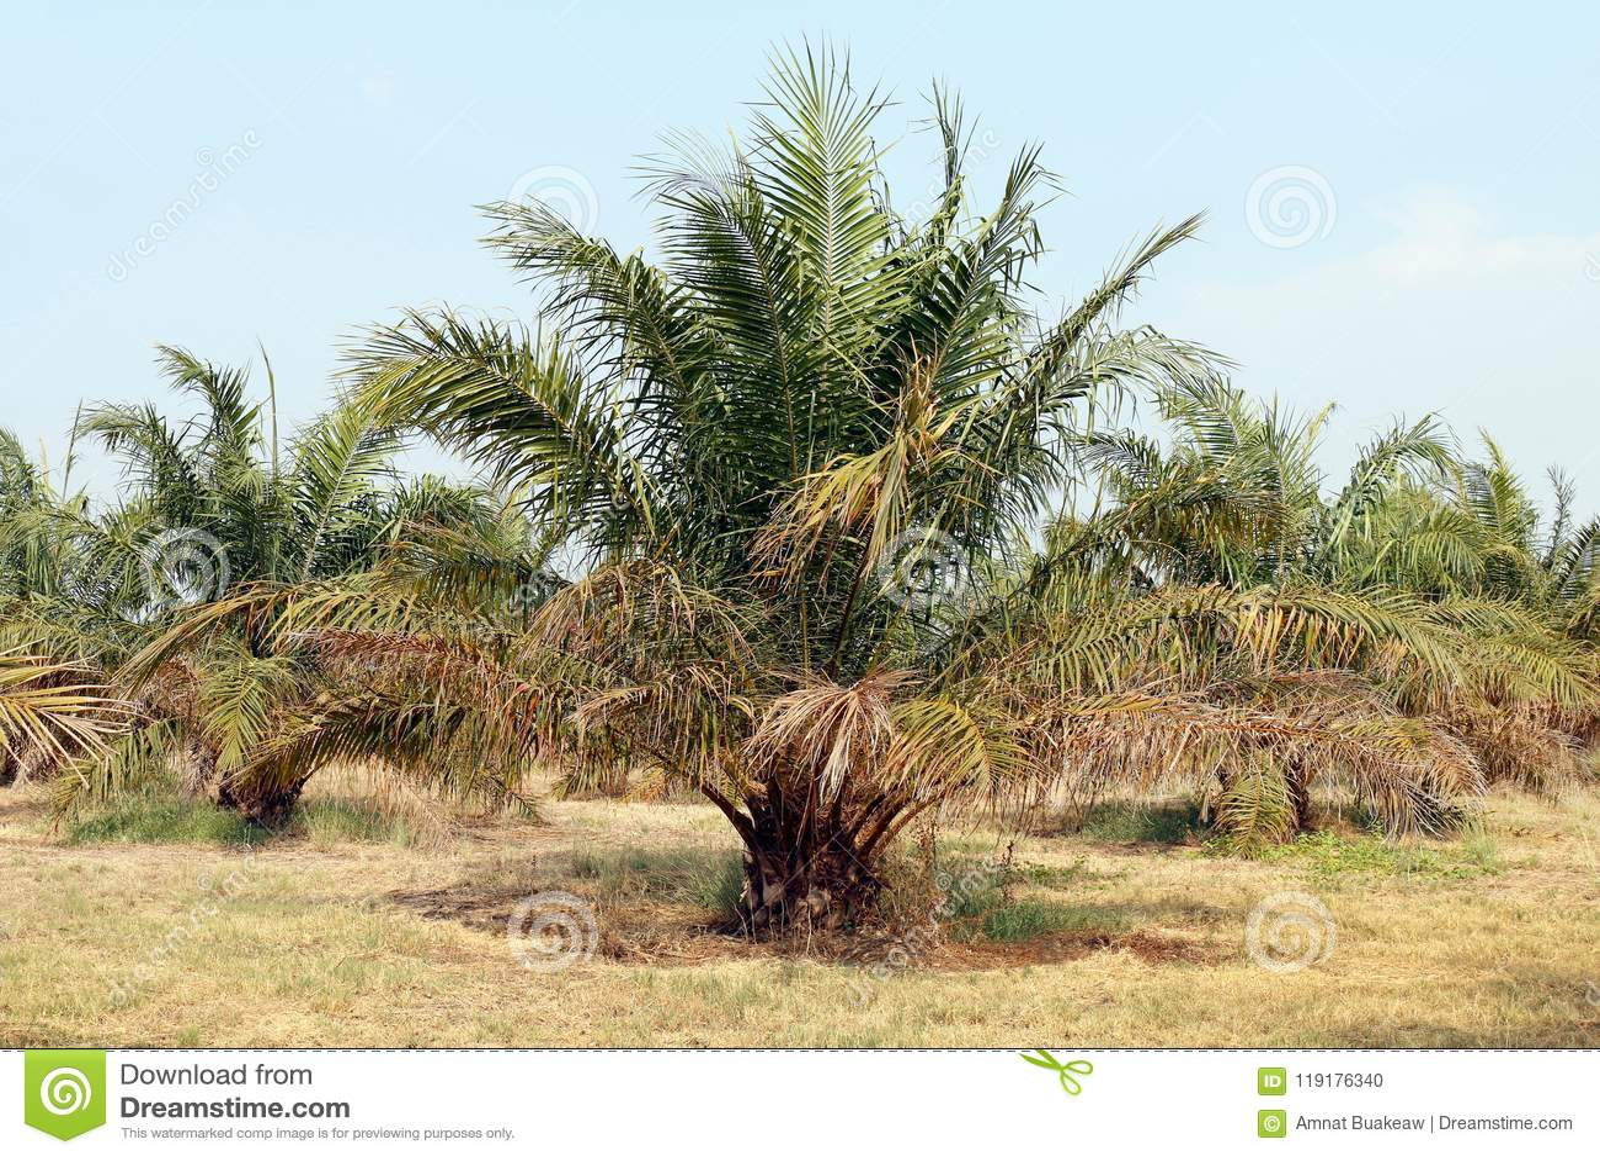 Palm, Oil Tree Palm Garden, Palm Plantation Stock Photo - Image of ...